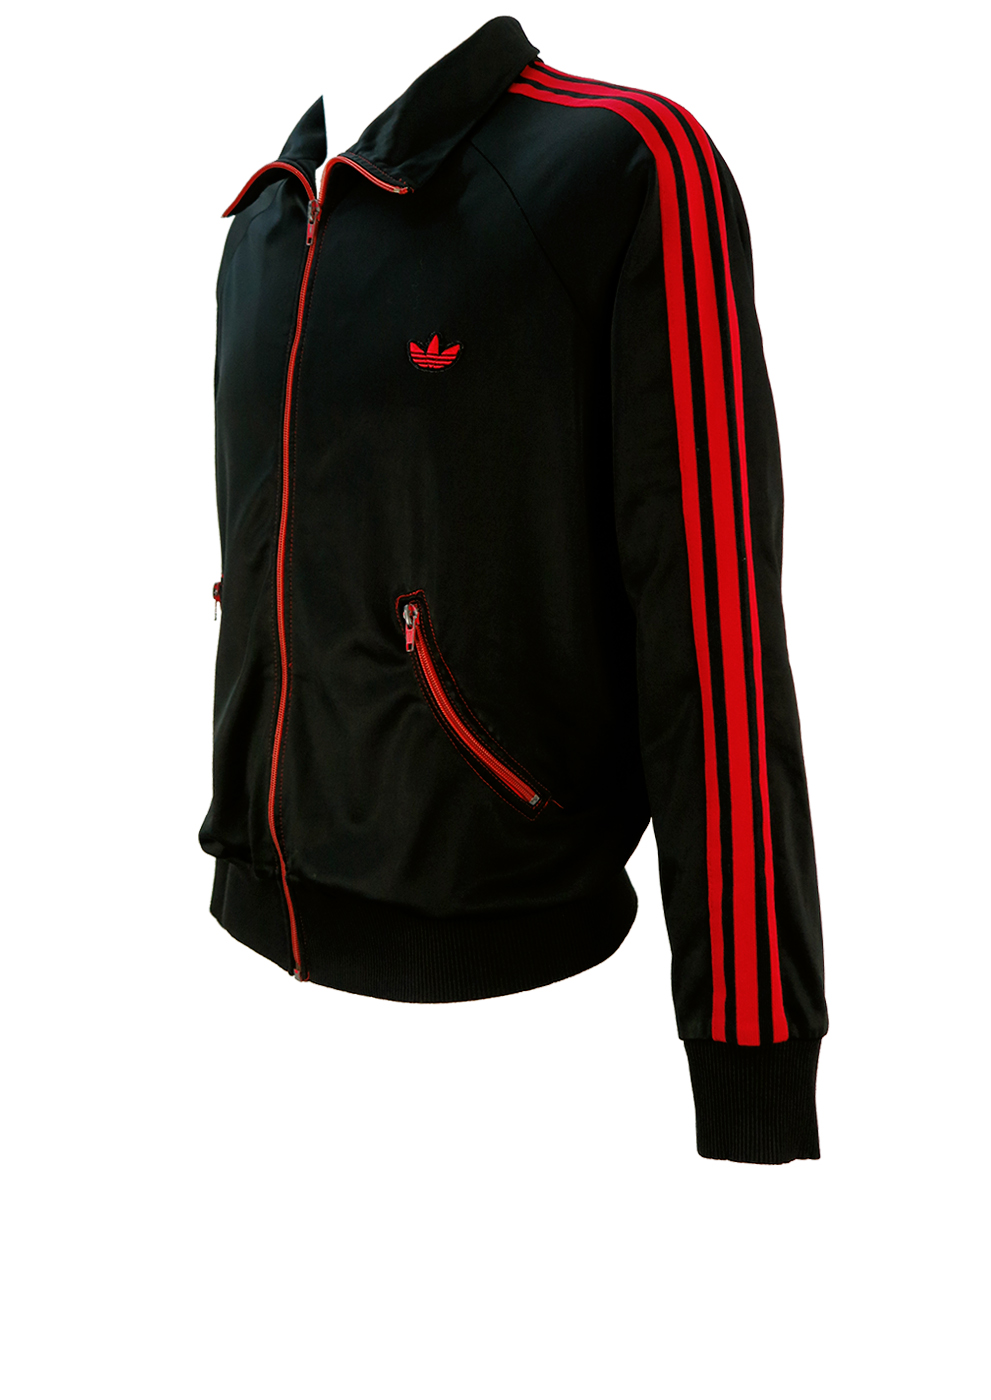 Existe Canoa Eliminar  Vintage 70's Adidas Black Track Jacket with Red Stripes and Curved Pockets  – M/L – Reign Vintage